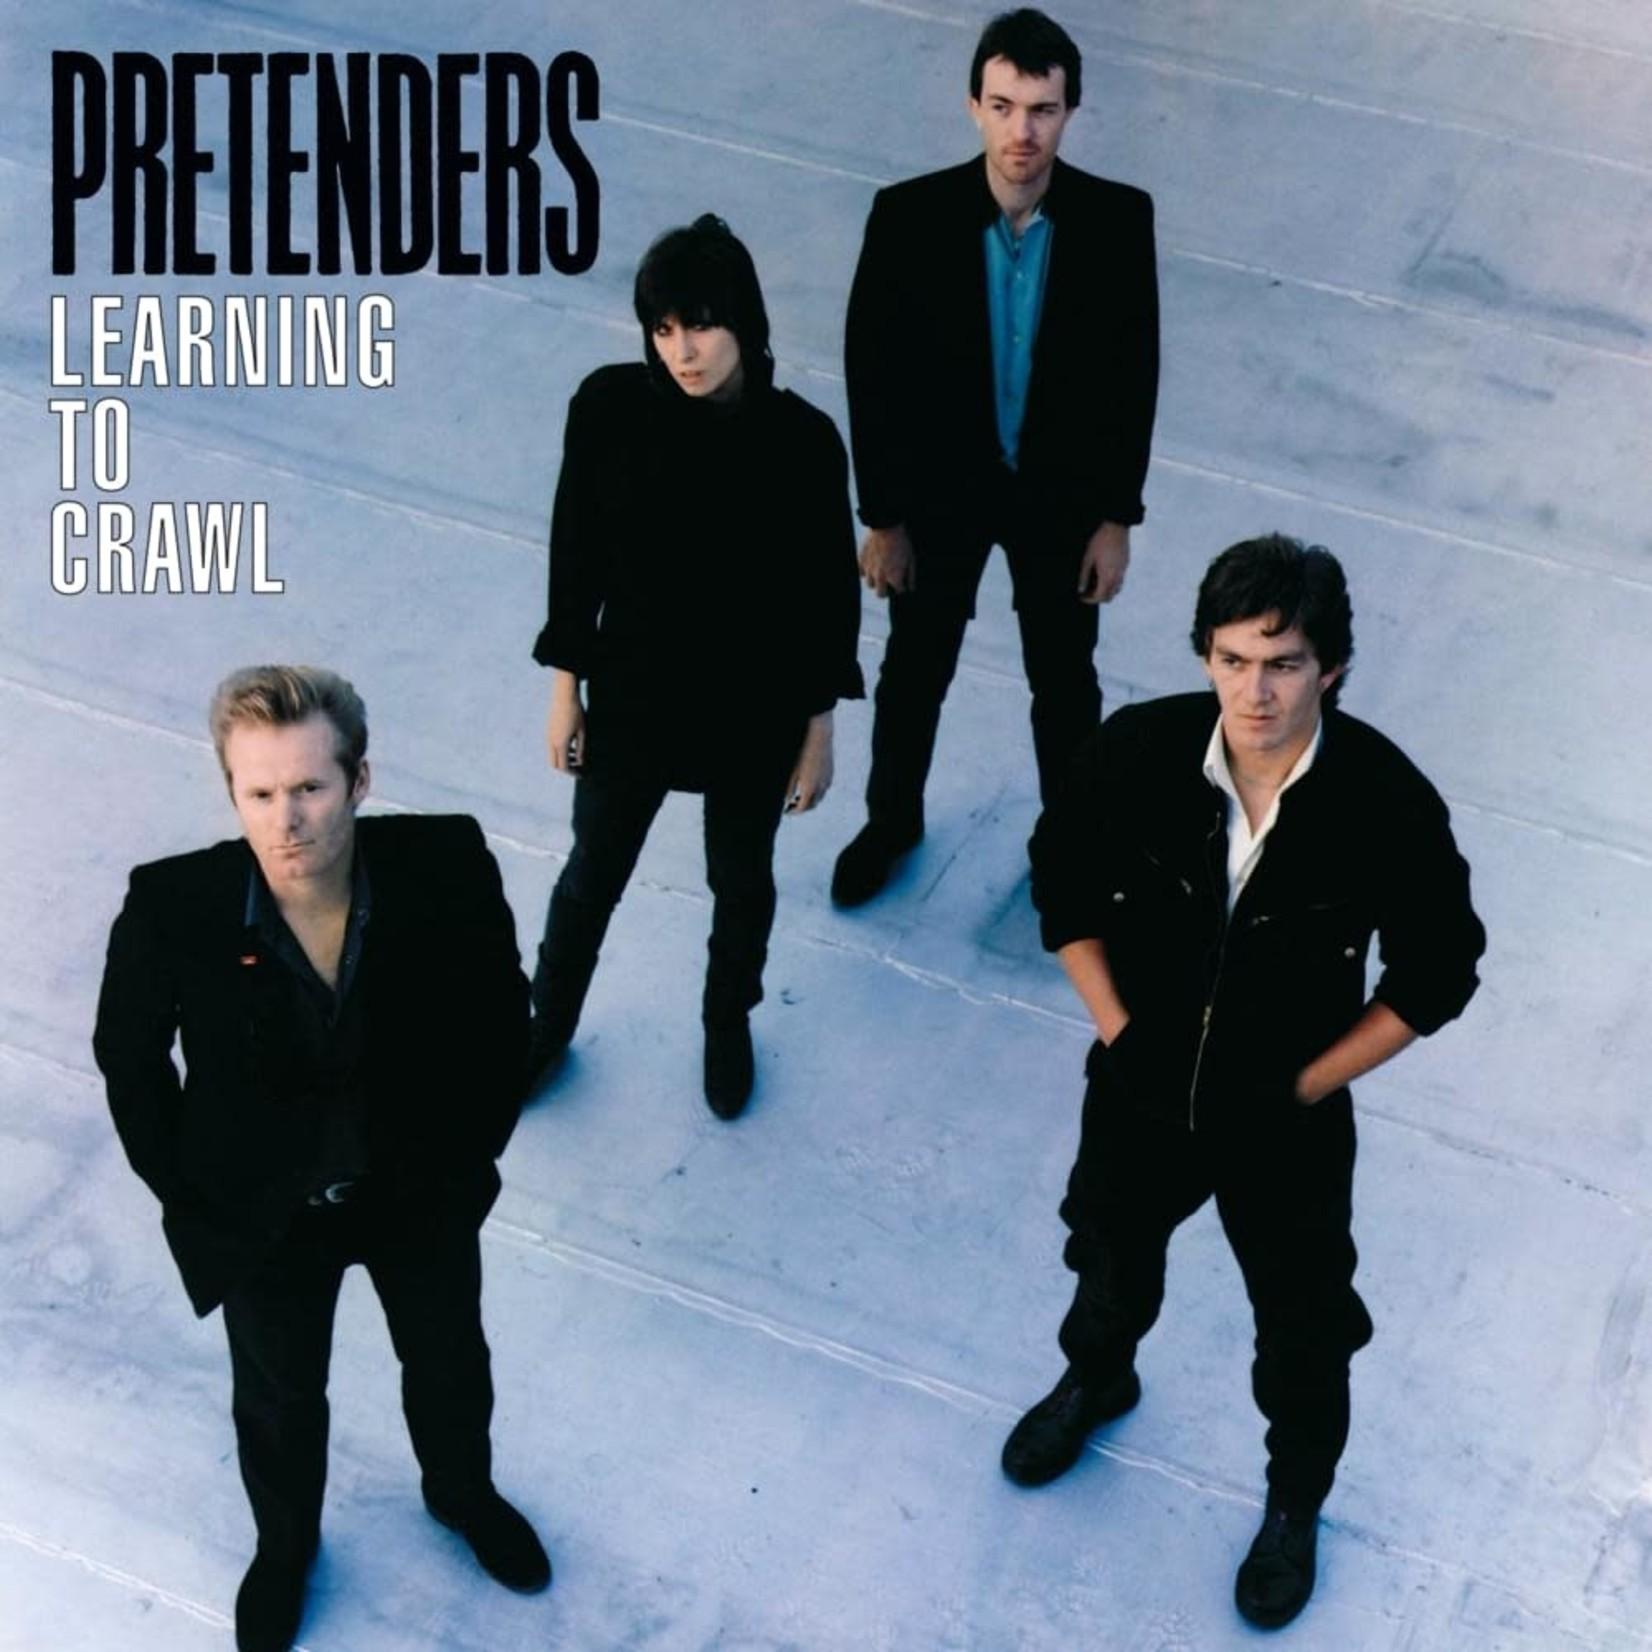 [Vintage] Pretenders: Learning to Crawl